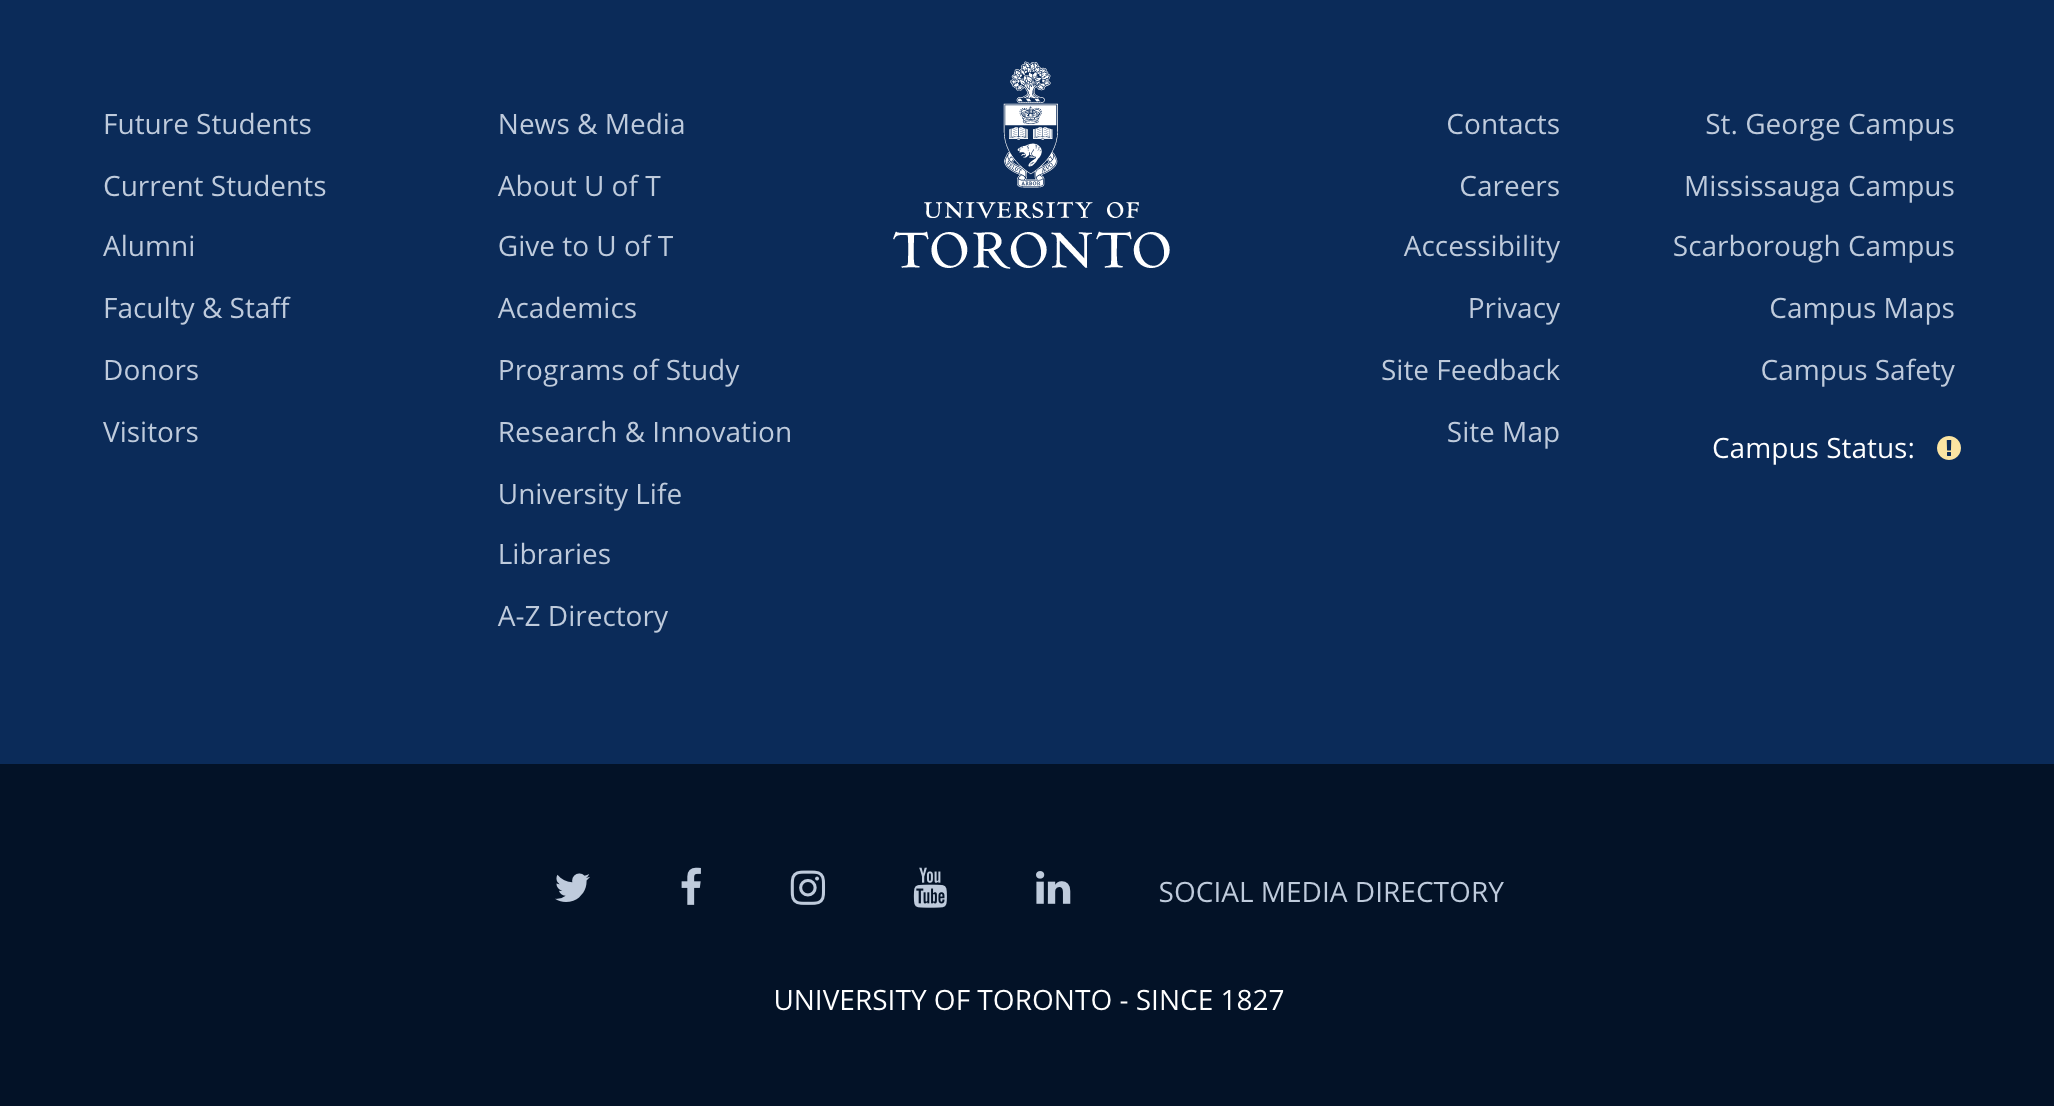 University of Toronto website footer